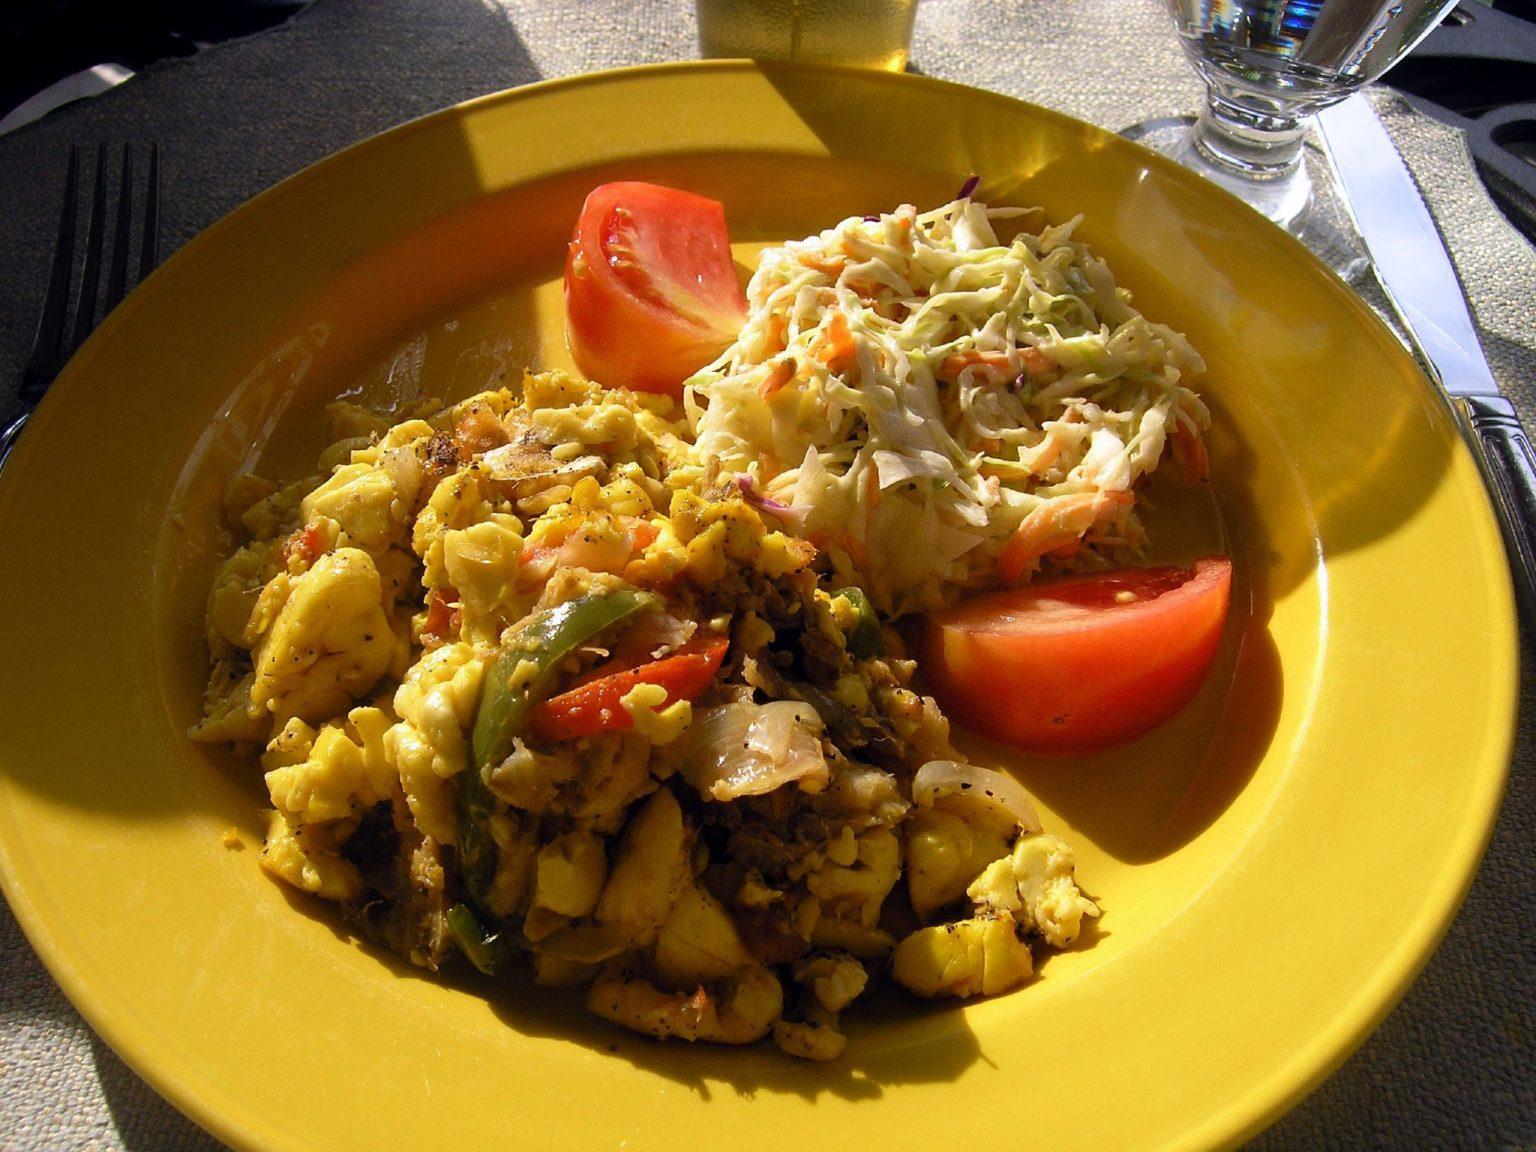 food in Jamaica, jamaican food, jamaican cuisine, jamaican dishes, jamaican drinks, jamaican appetizers, jamaican traditional food